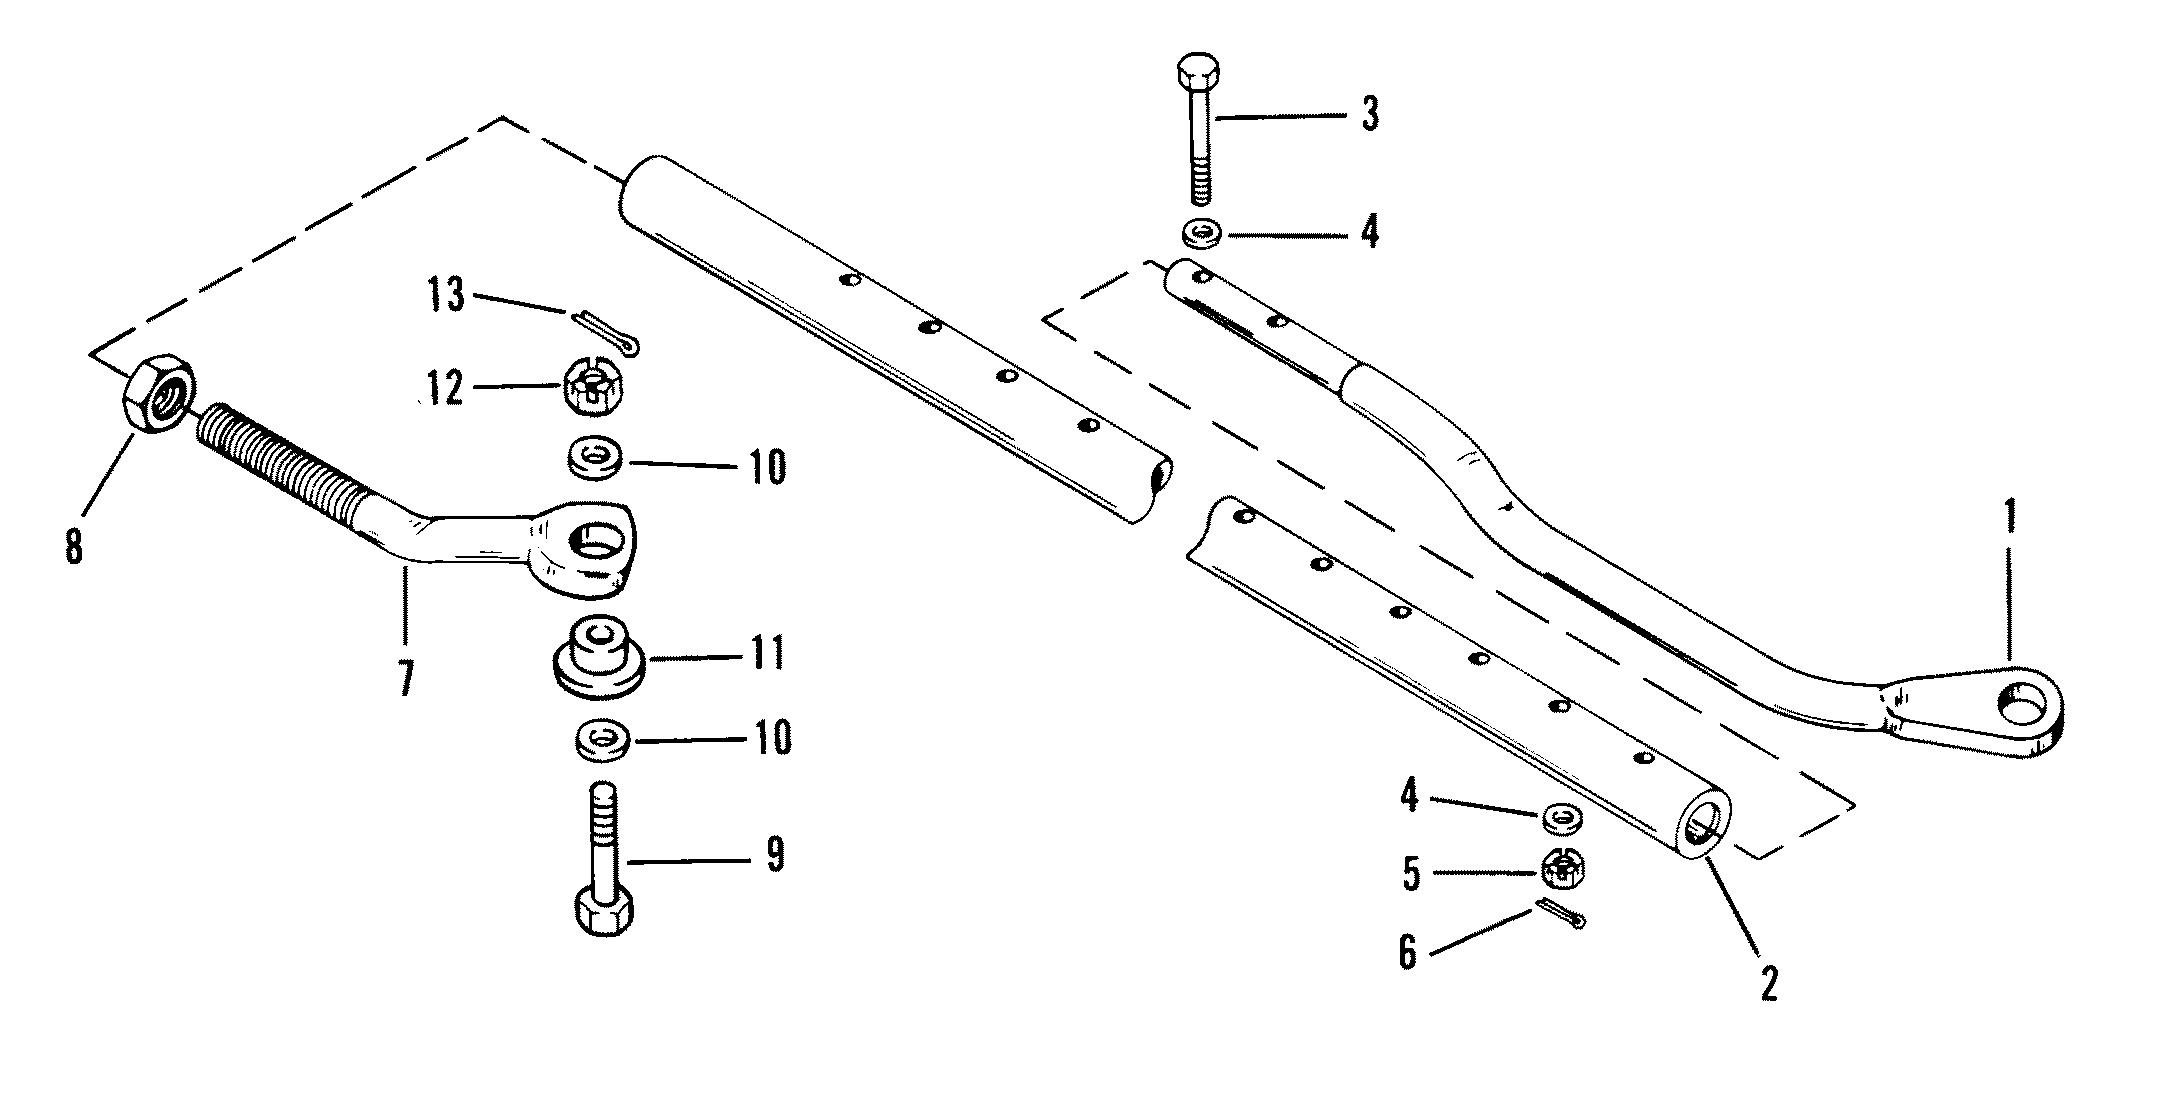 Dual Engine Tie Bar Kit For Accessories Mercruiser Volume I